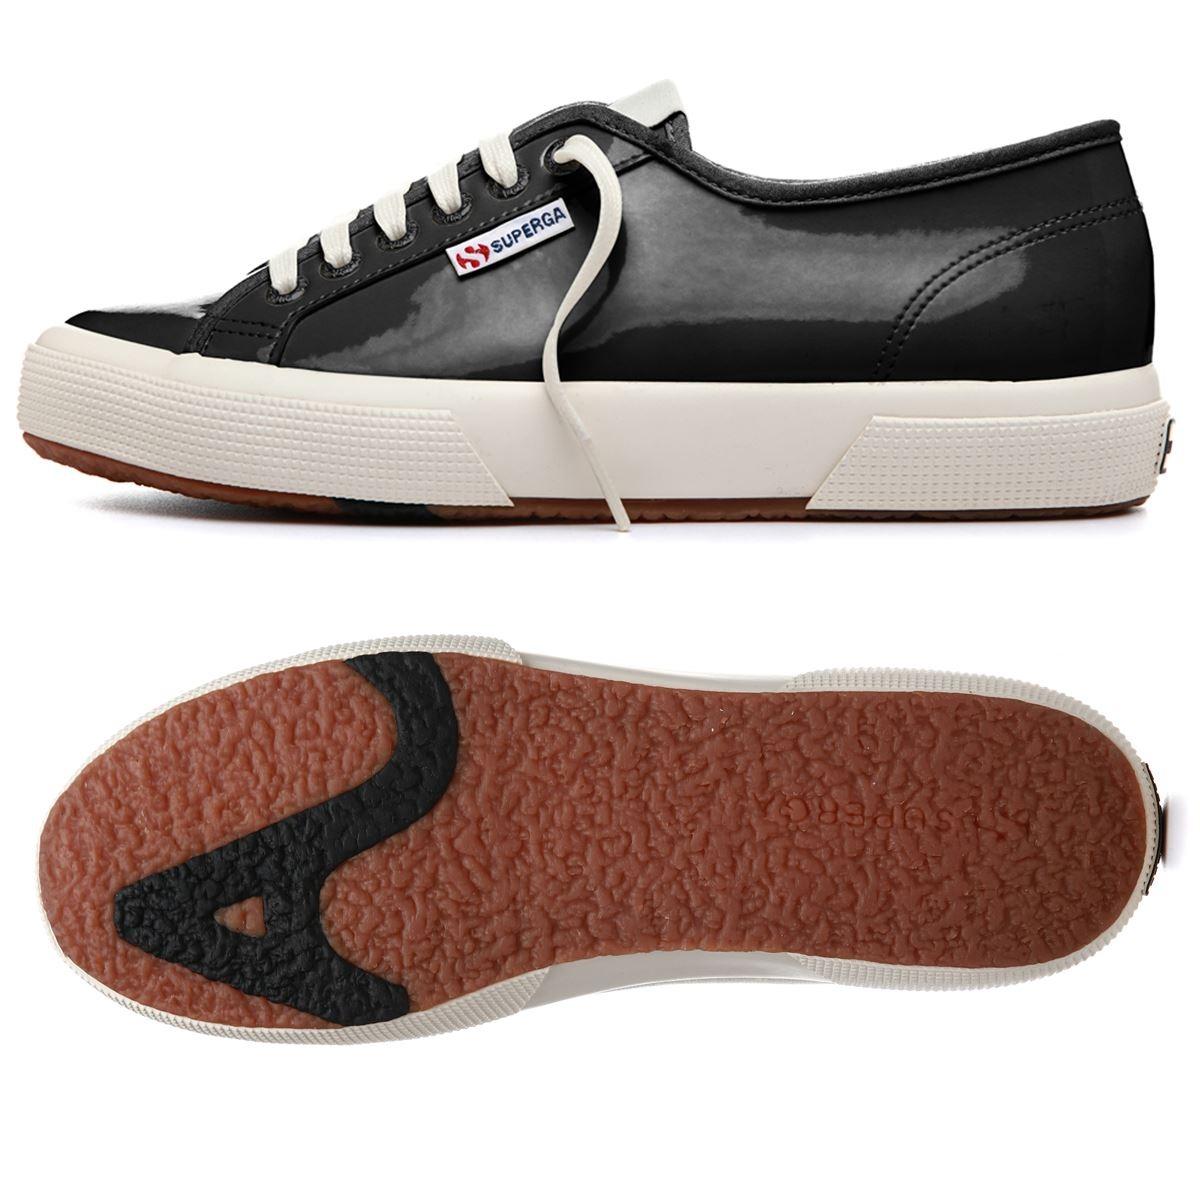 d21a0126fbf09 Zapatos Superga 2750 Varnishw S00en10b -   325.000 en Mercado Libre